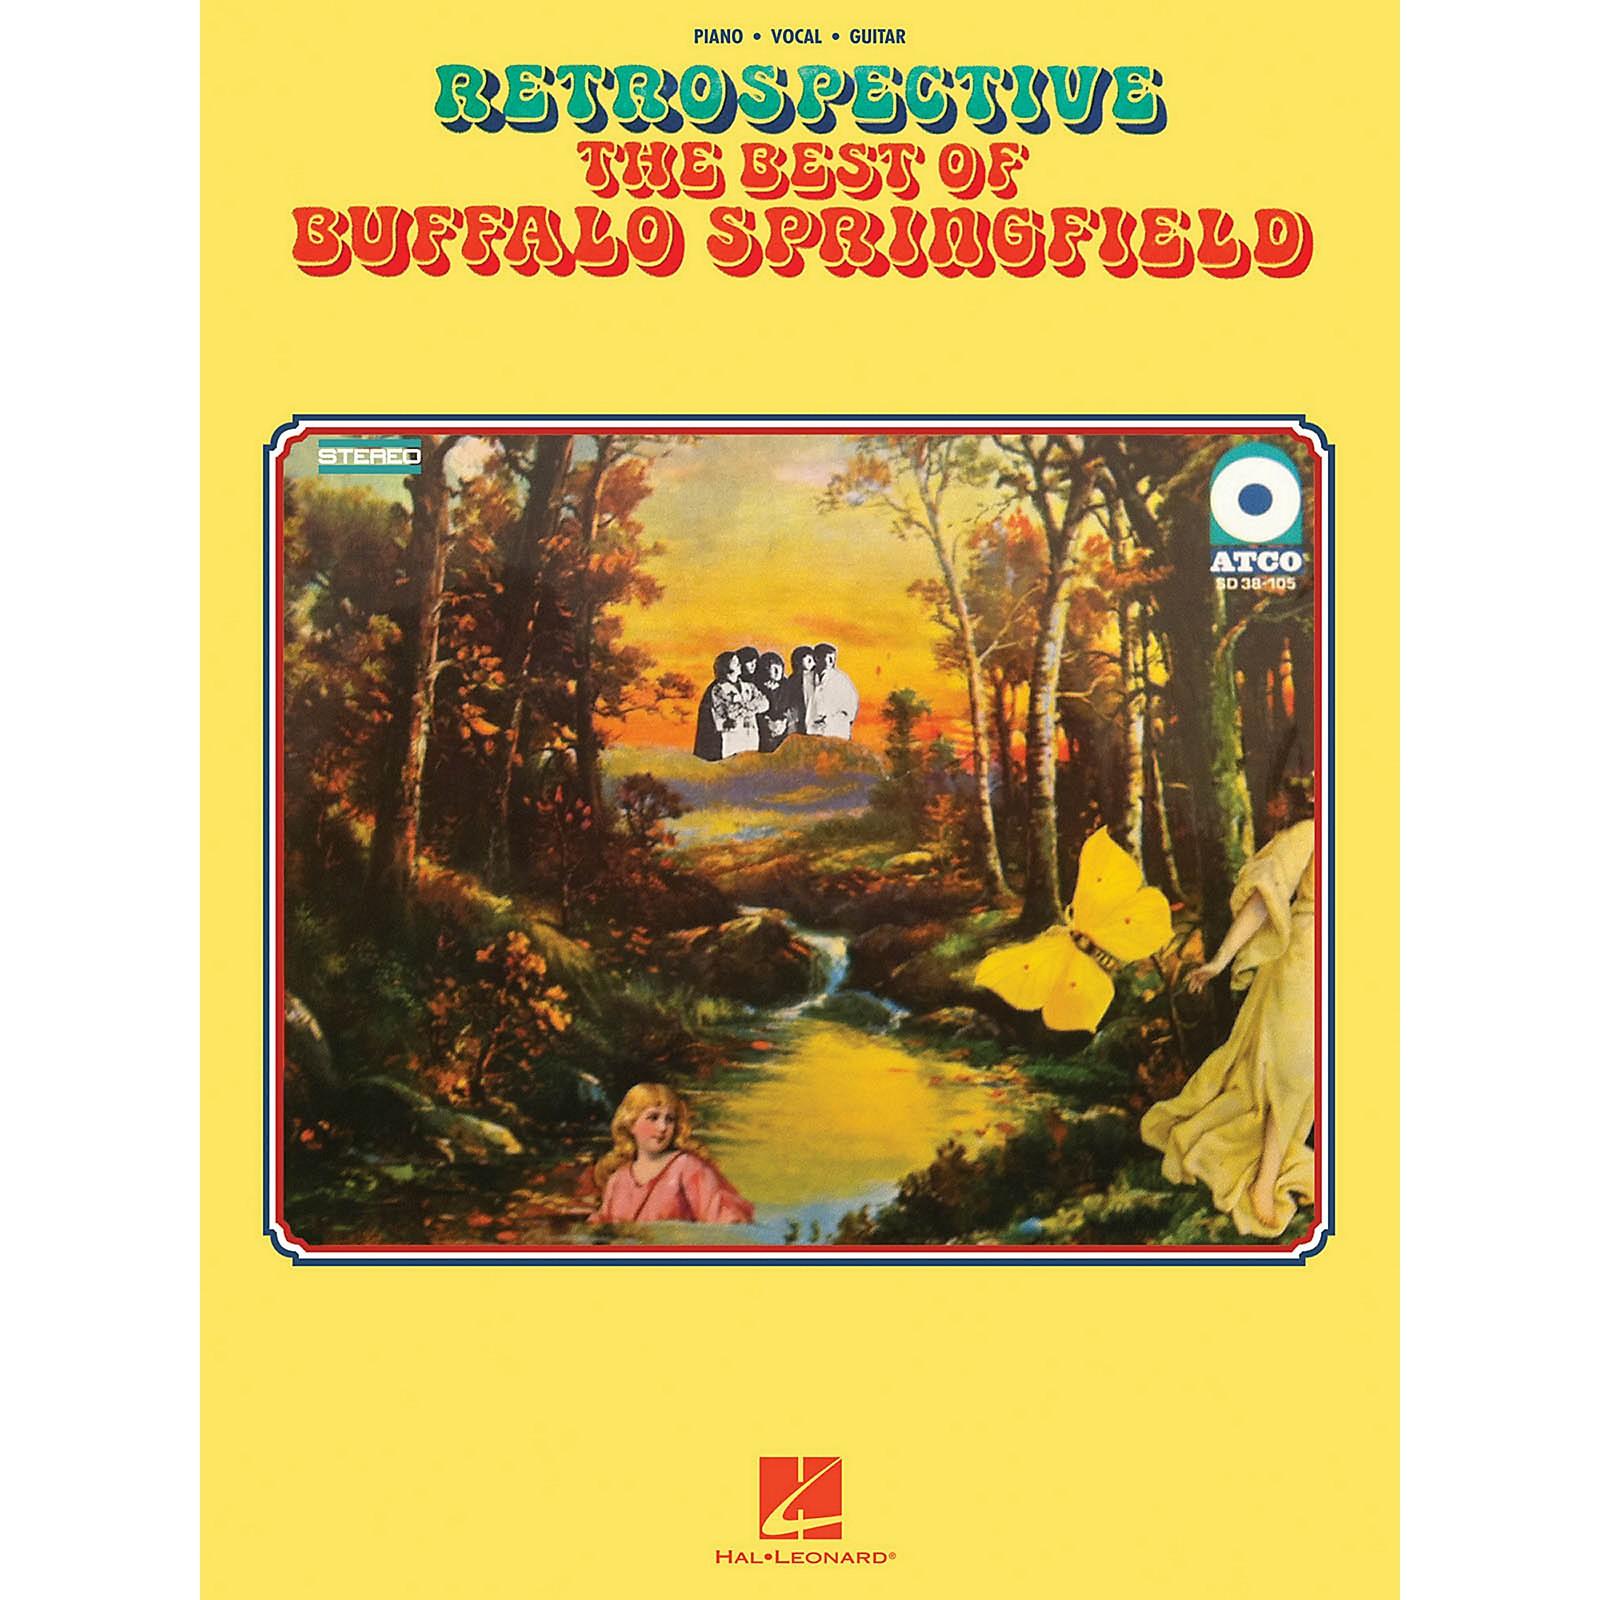 Hal Leonard Retrospective - The Best of Buffalo Springfield for Piano/Vocal/Guitar